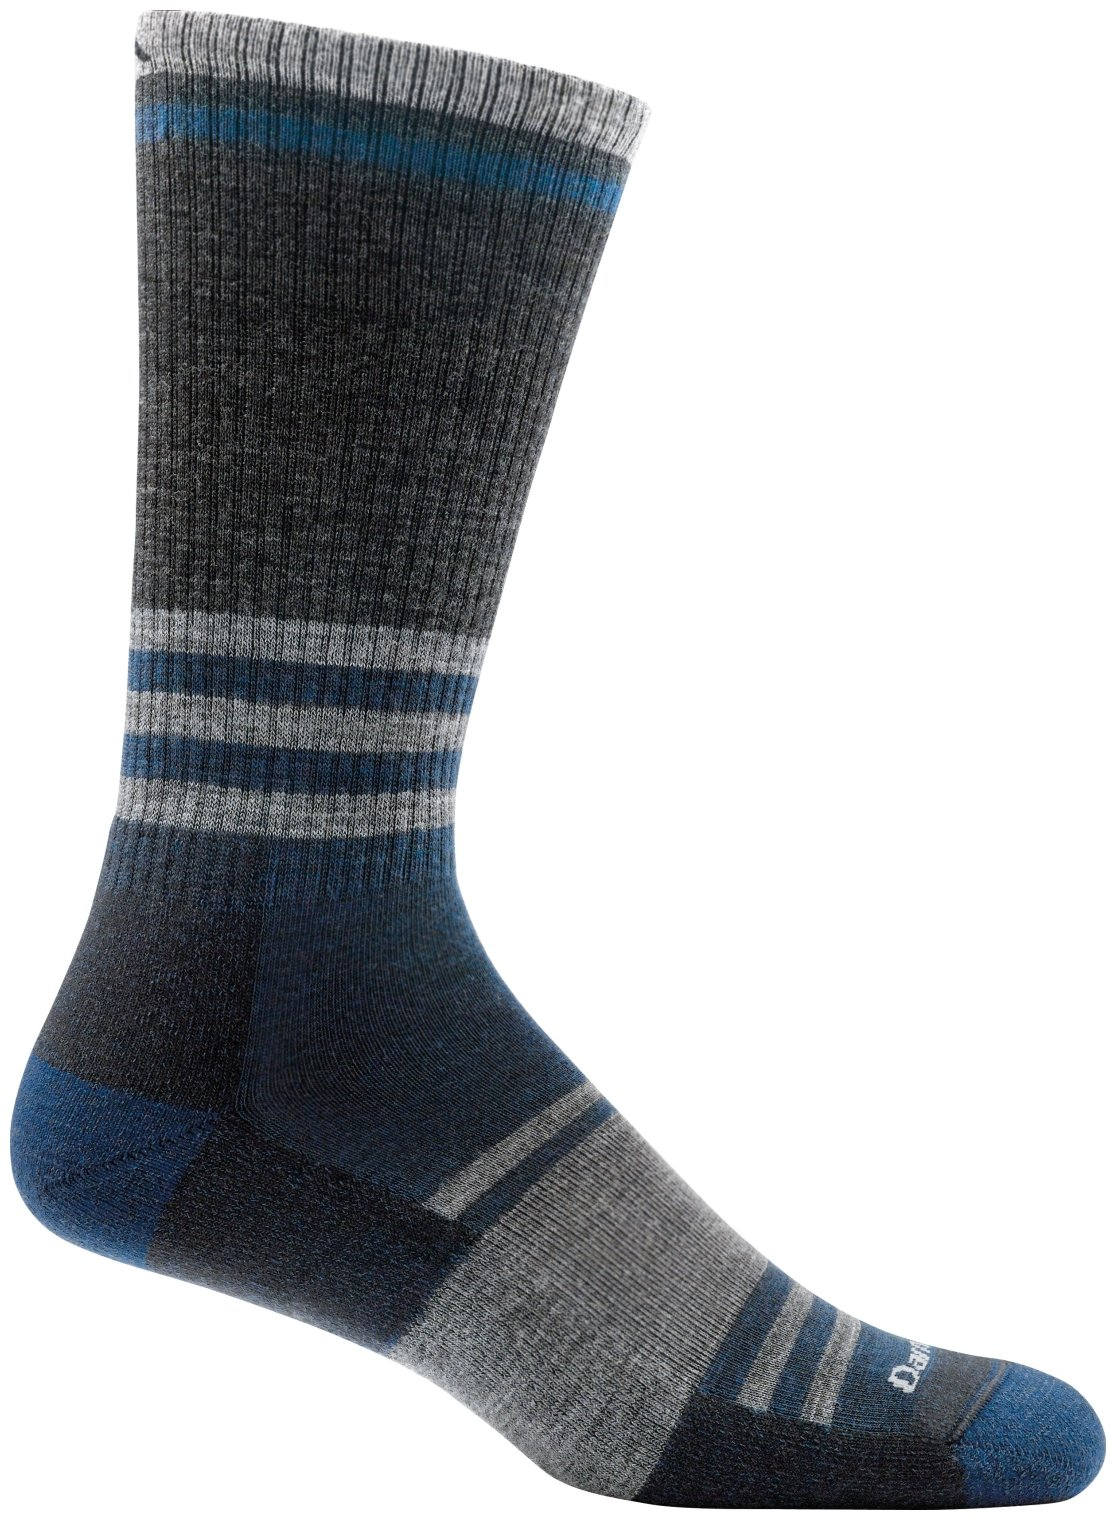 Darn Tough Spur Boot Light Cushion Sock - Men's Gray X-Large